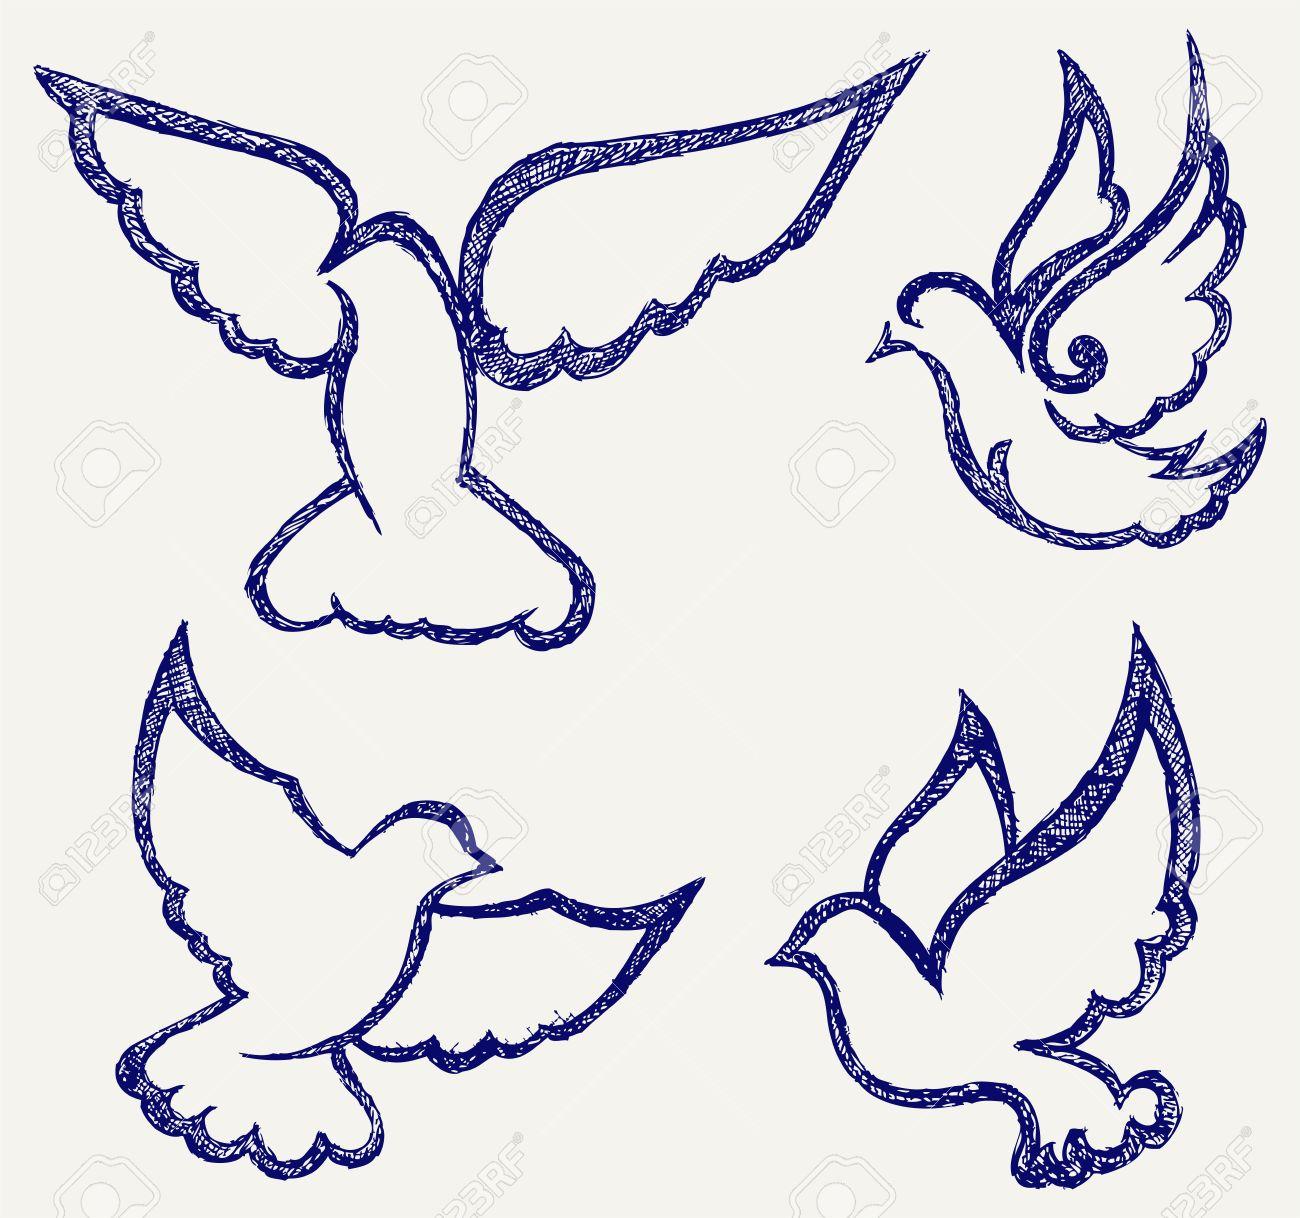 dove symbol - 15832130